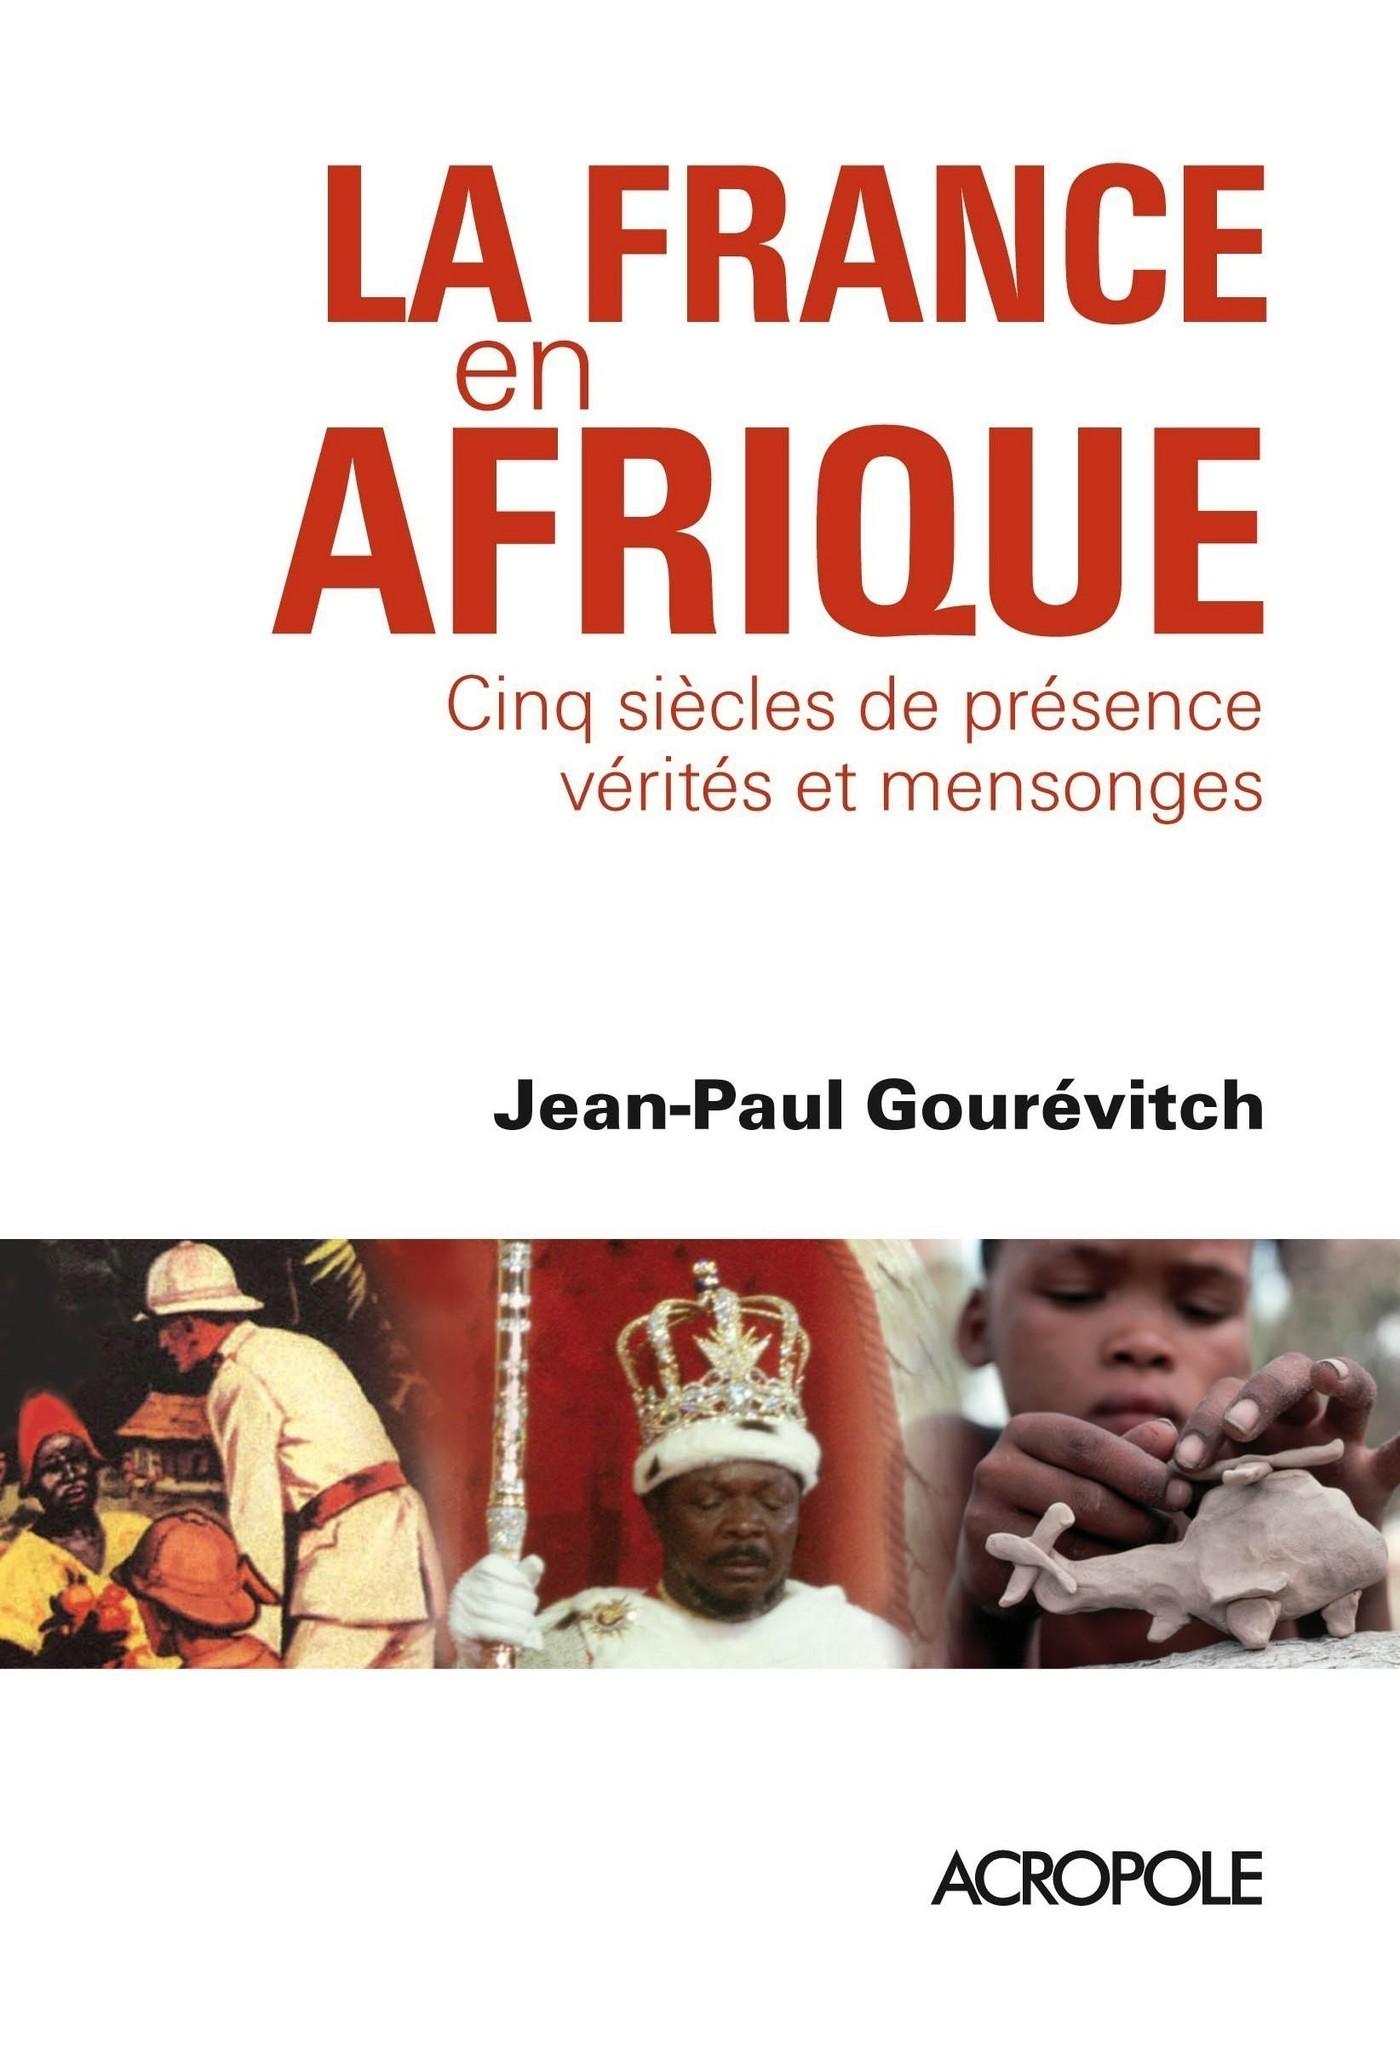 La France en Afrique (ebook)